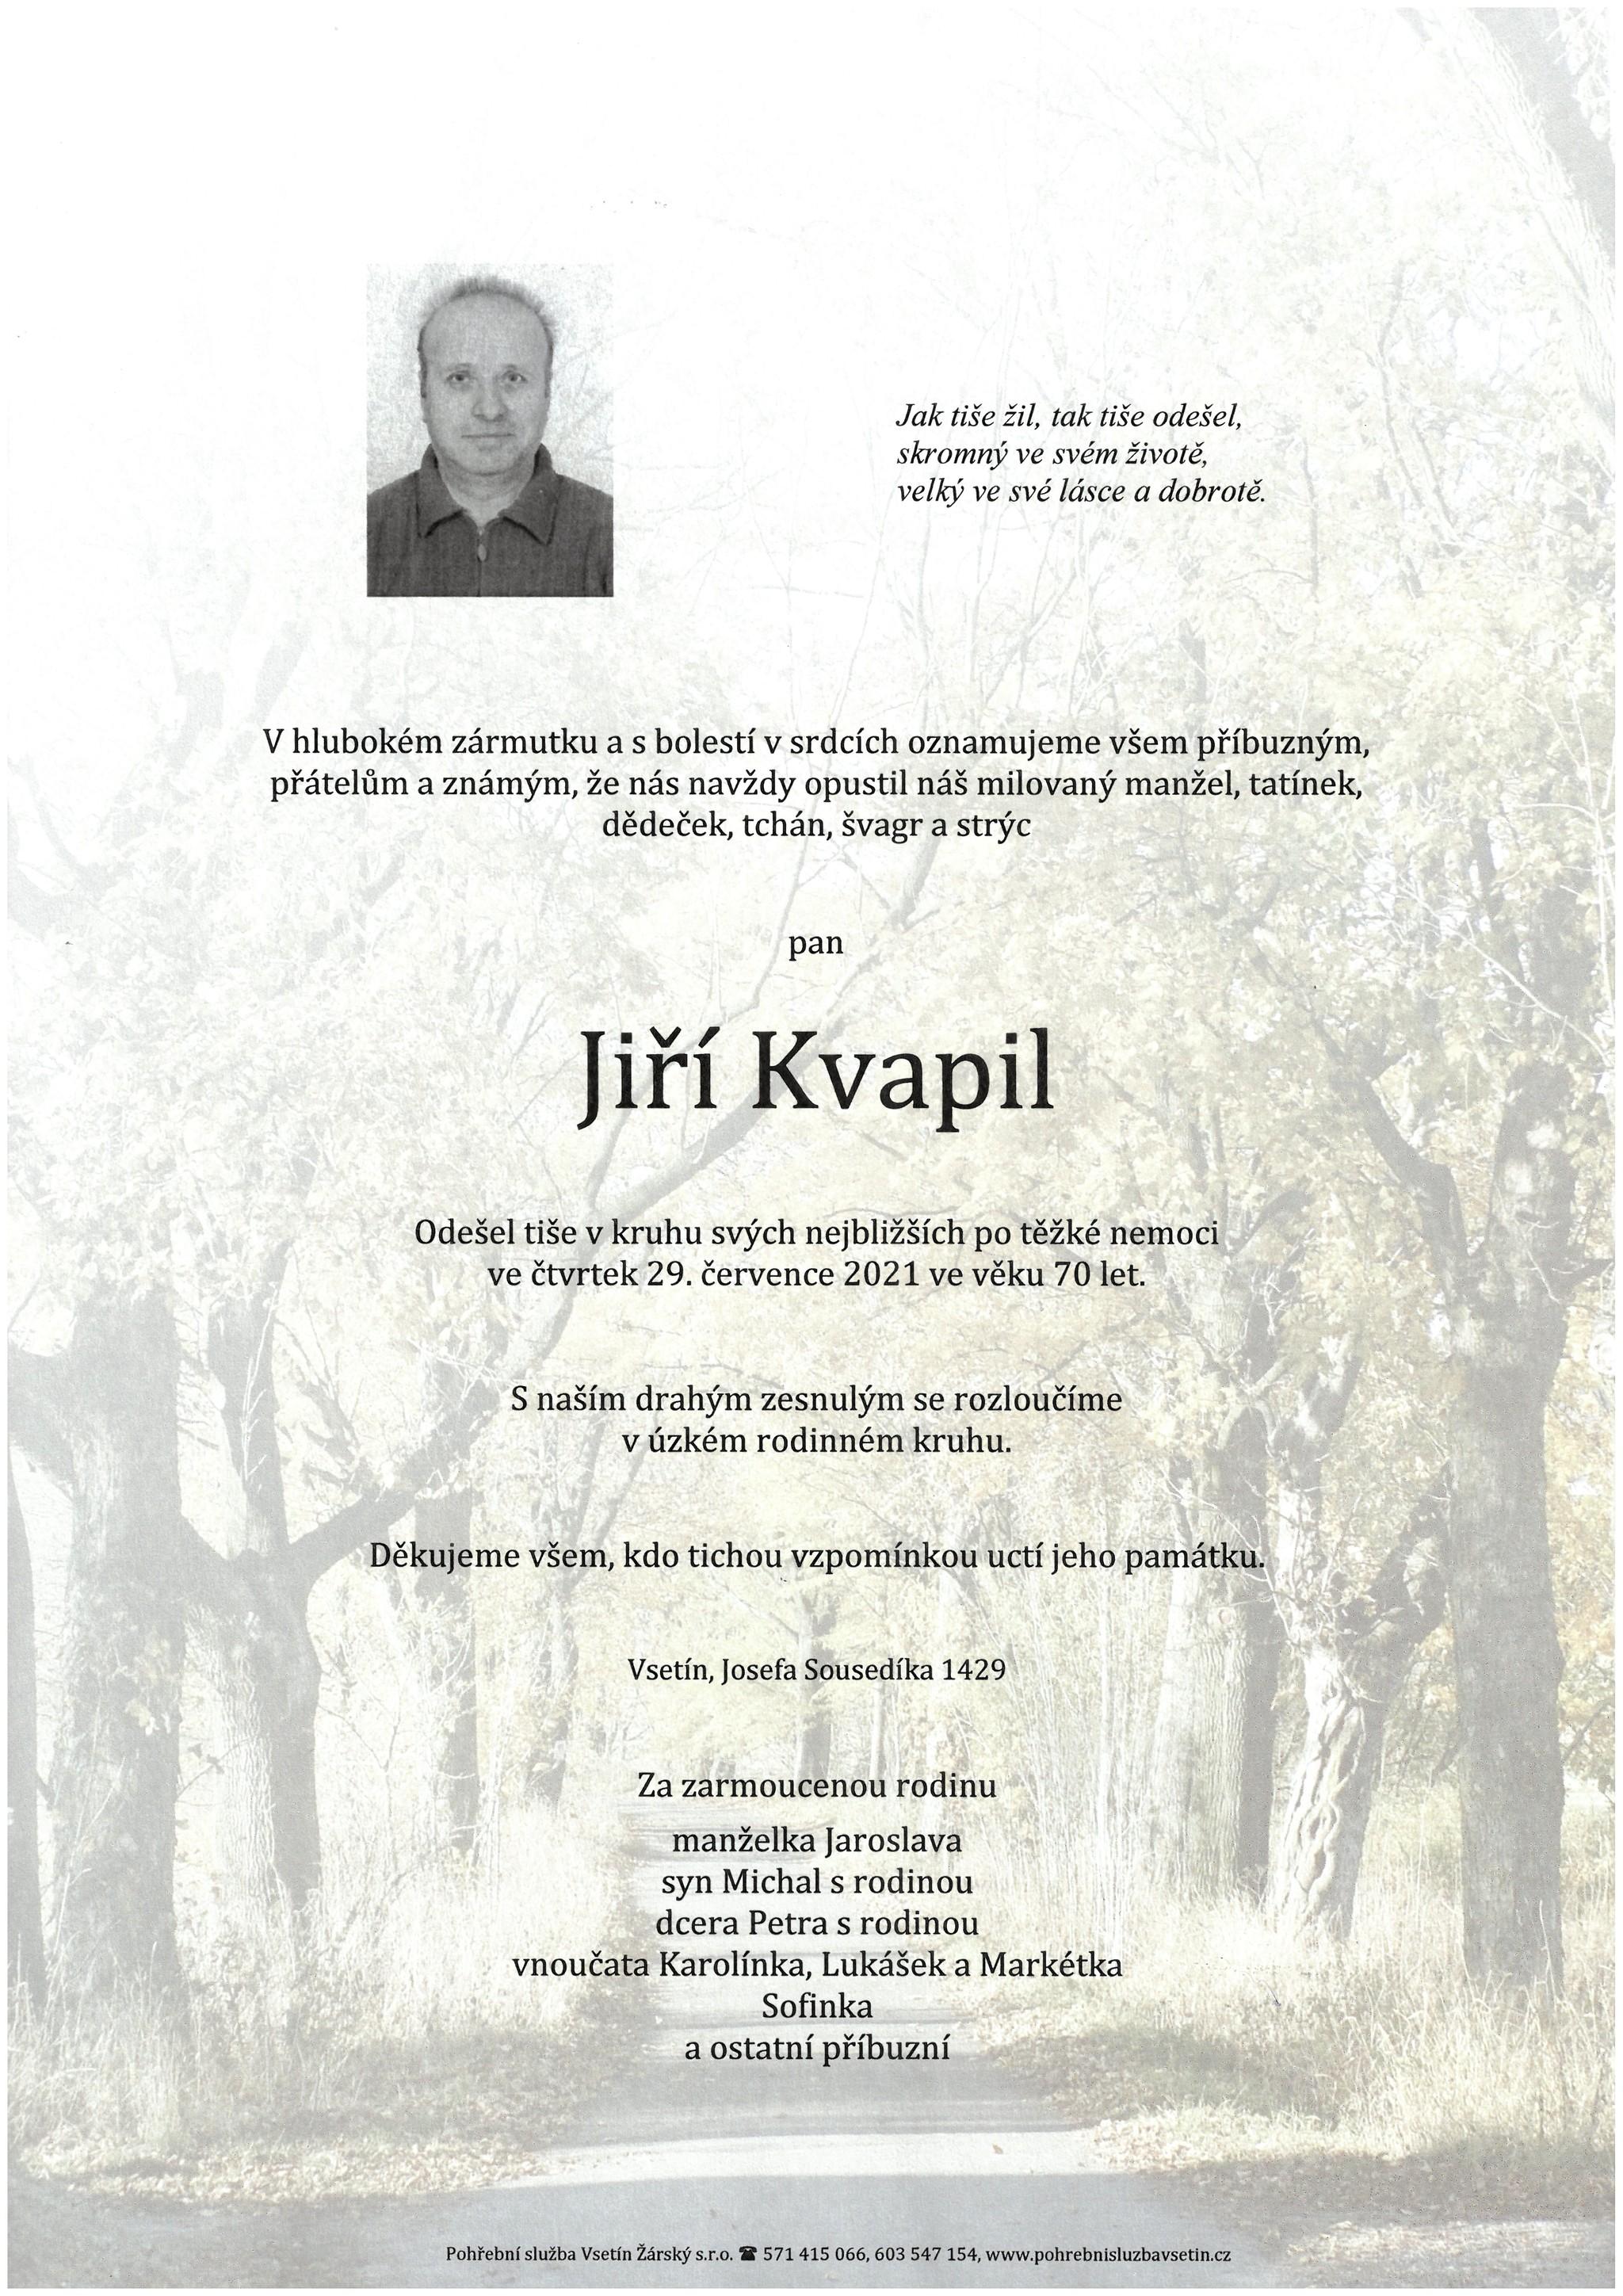 Jiří Kvapil